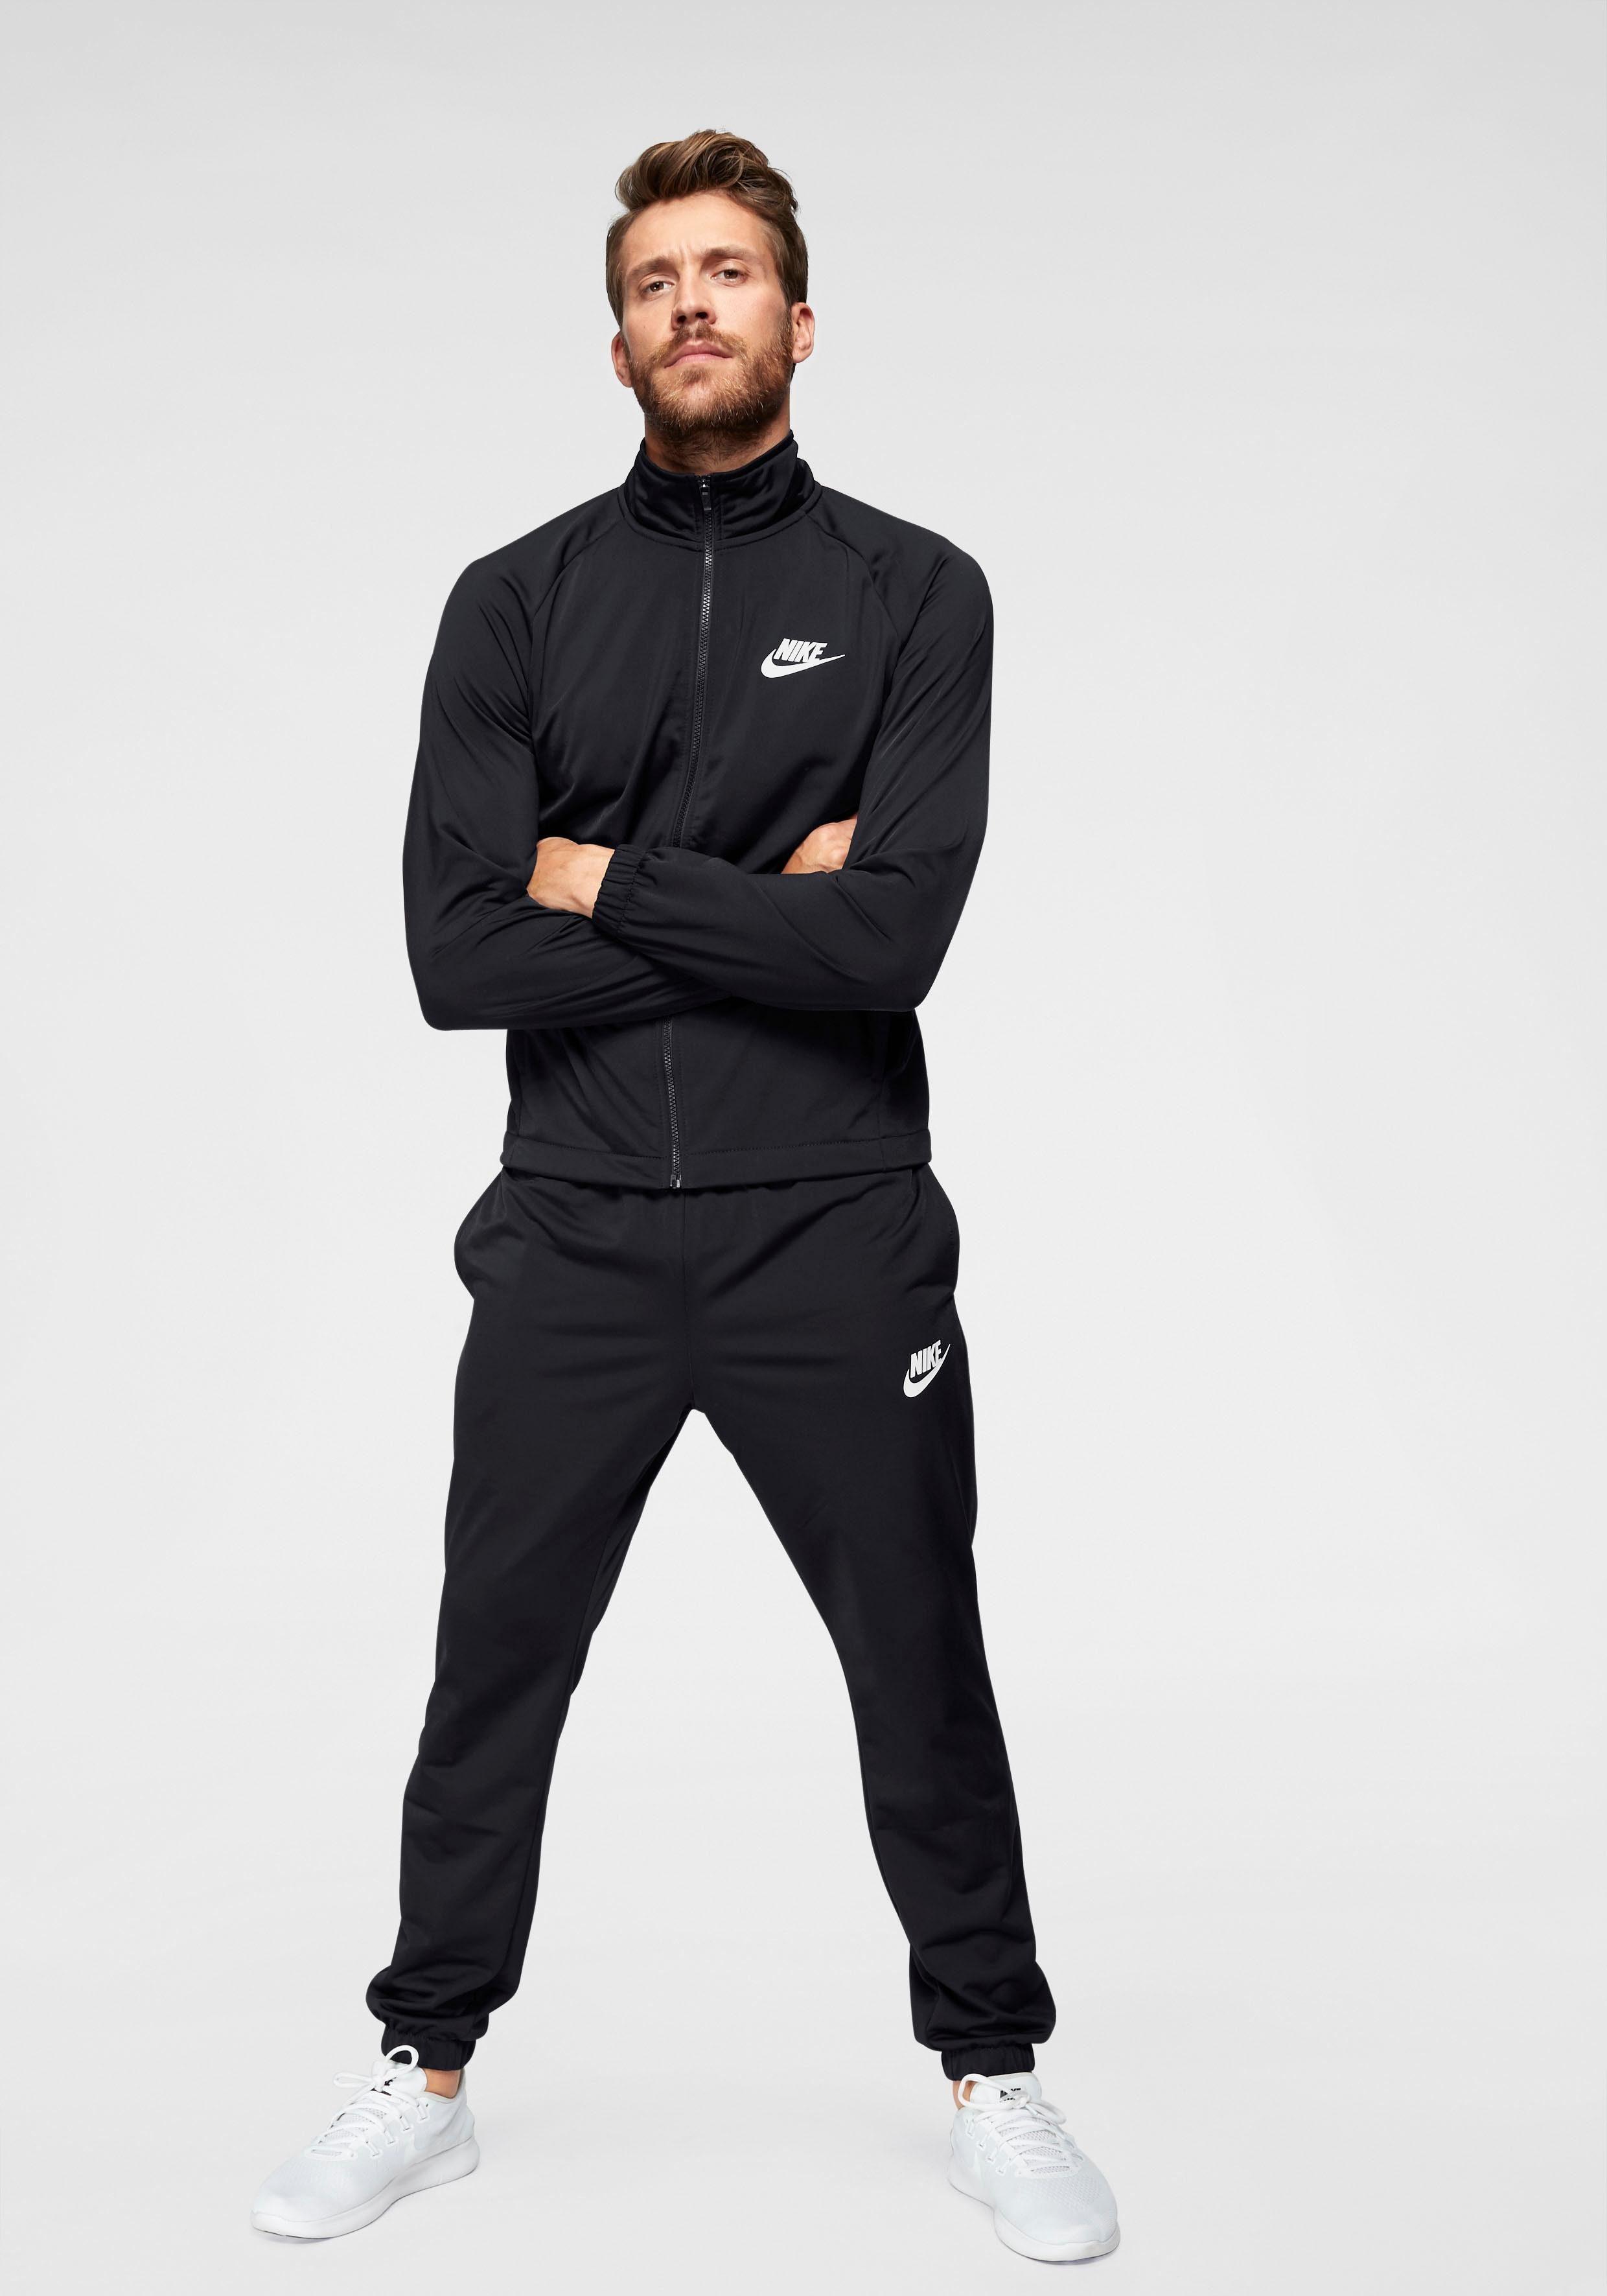 Nike Sportswear Trainingsanzug »M NSW TRK SUIT PK BASIC« (Set, 2 tlg)